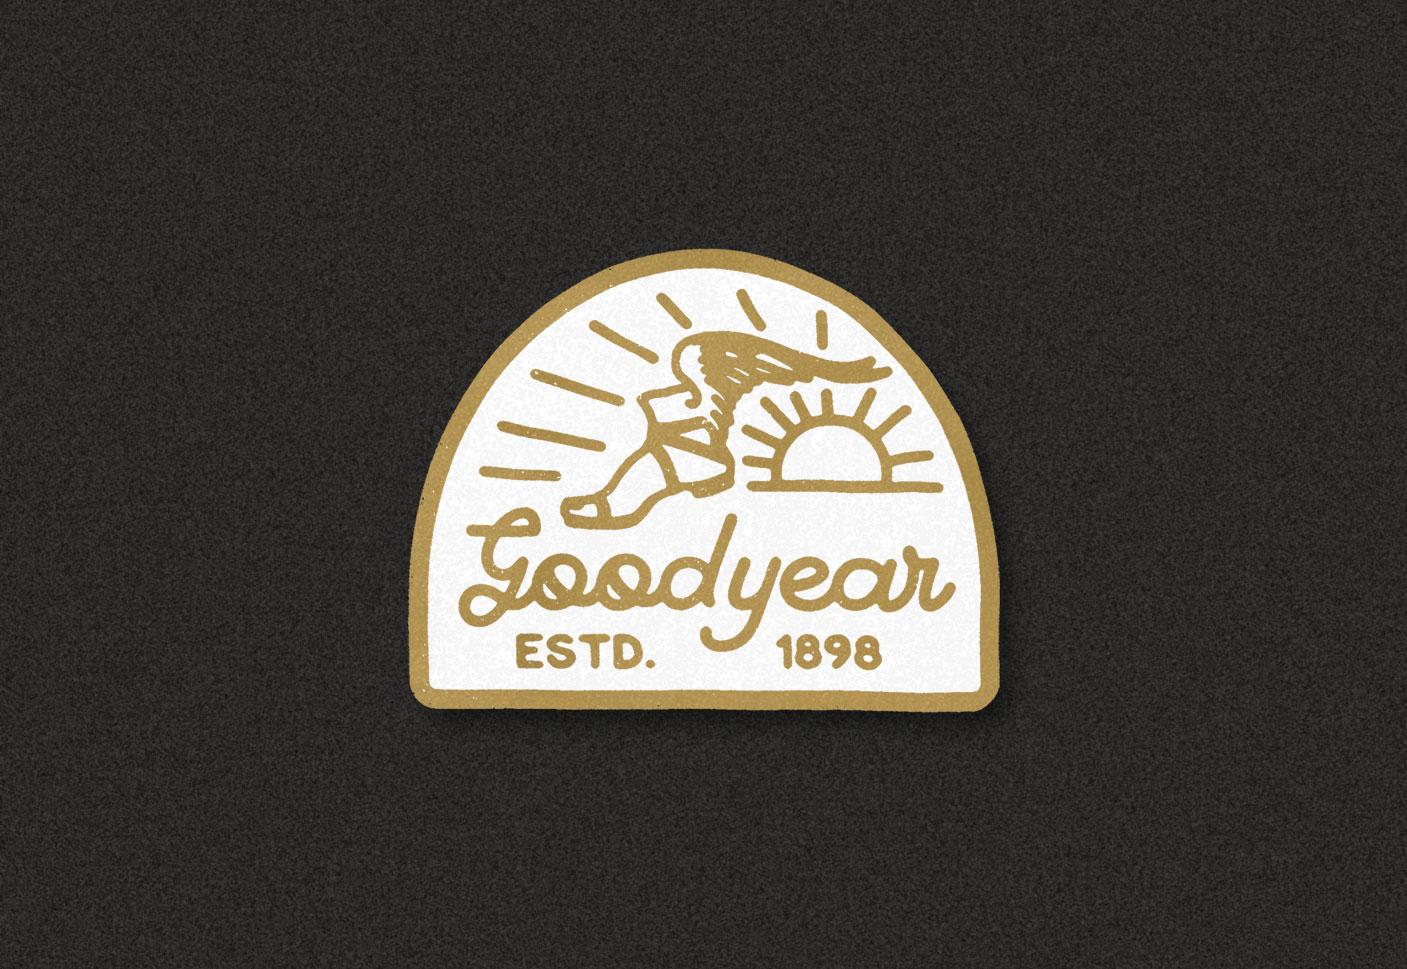 Goodyear_Wingfoot-Sun_black-background_wide.jpg